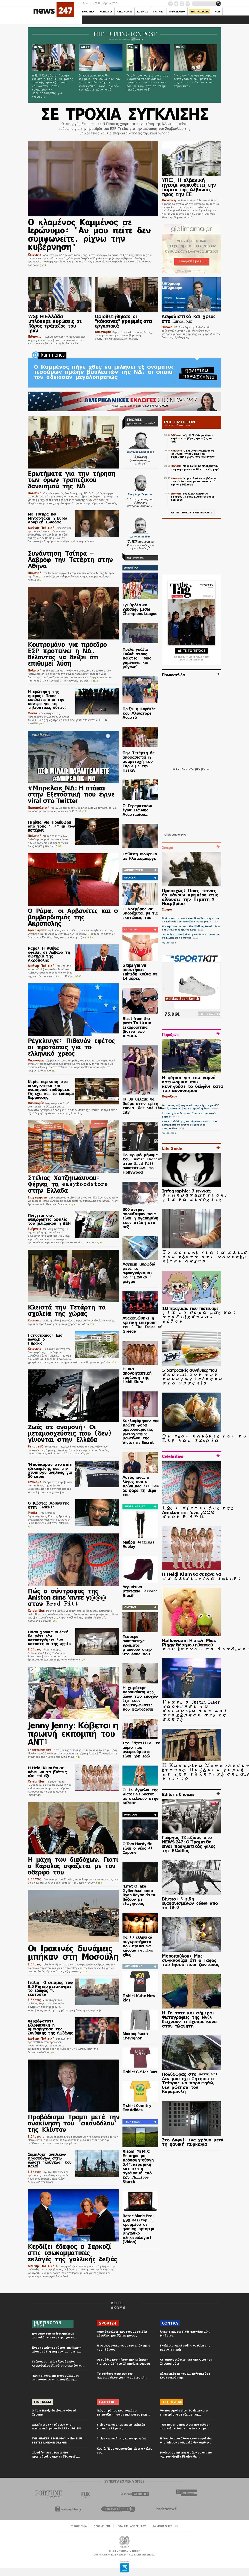 News 247 at Wednesday Nov. 2, 2016, 12:10 a.m. UTC